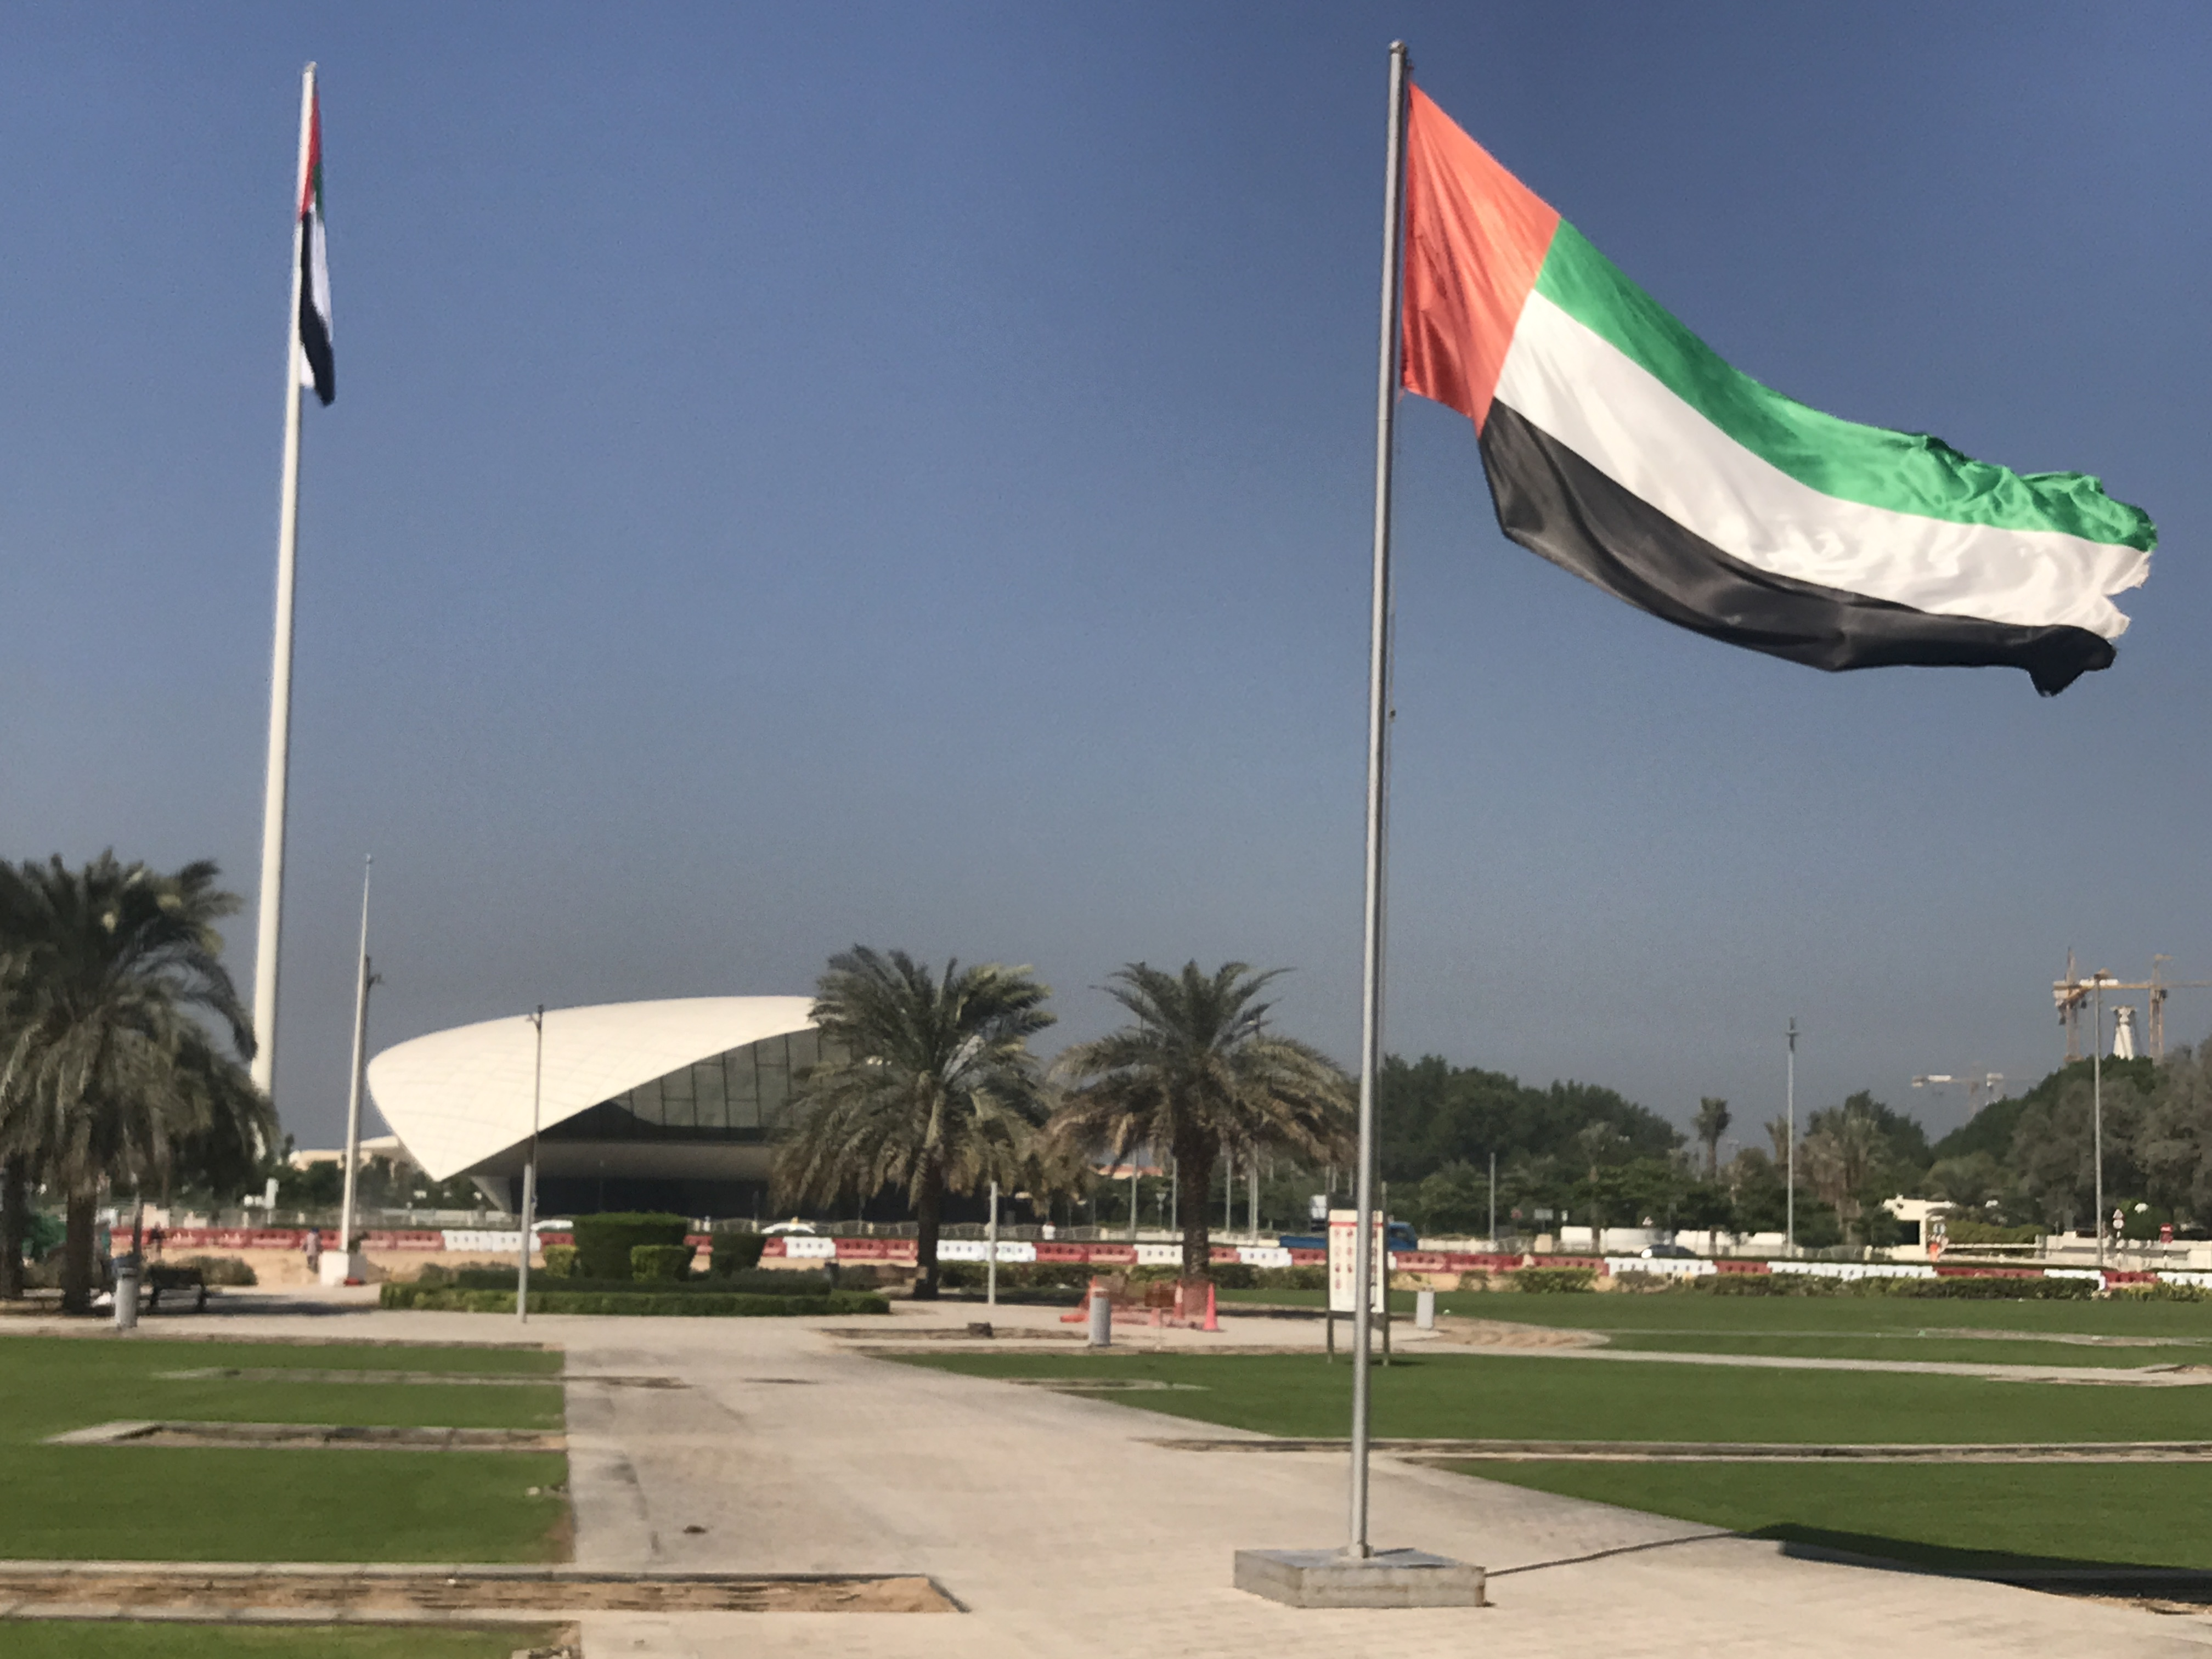 UAE flat with Etihad Museum in background